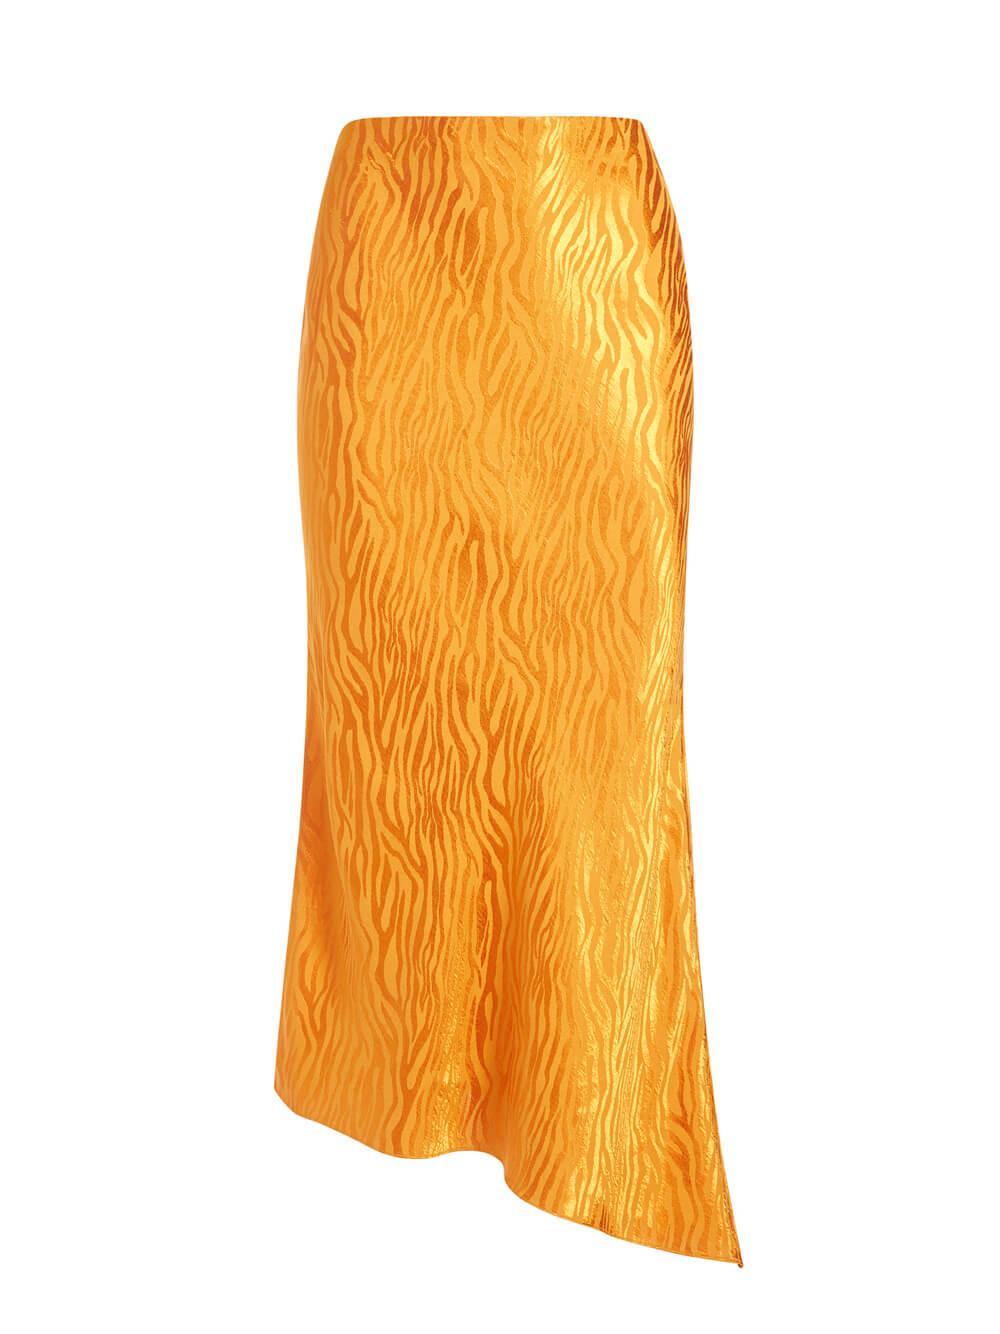 Maeve Asymmetrical Slip Skirt Item # CC008Q17309